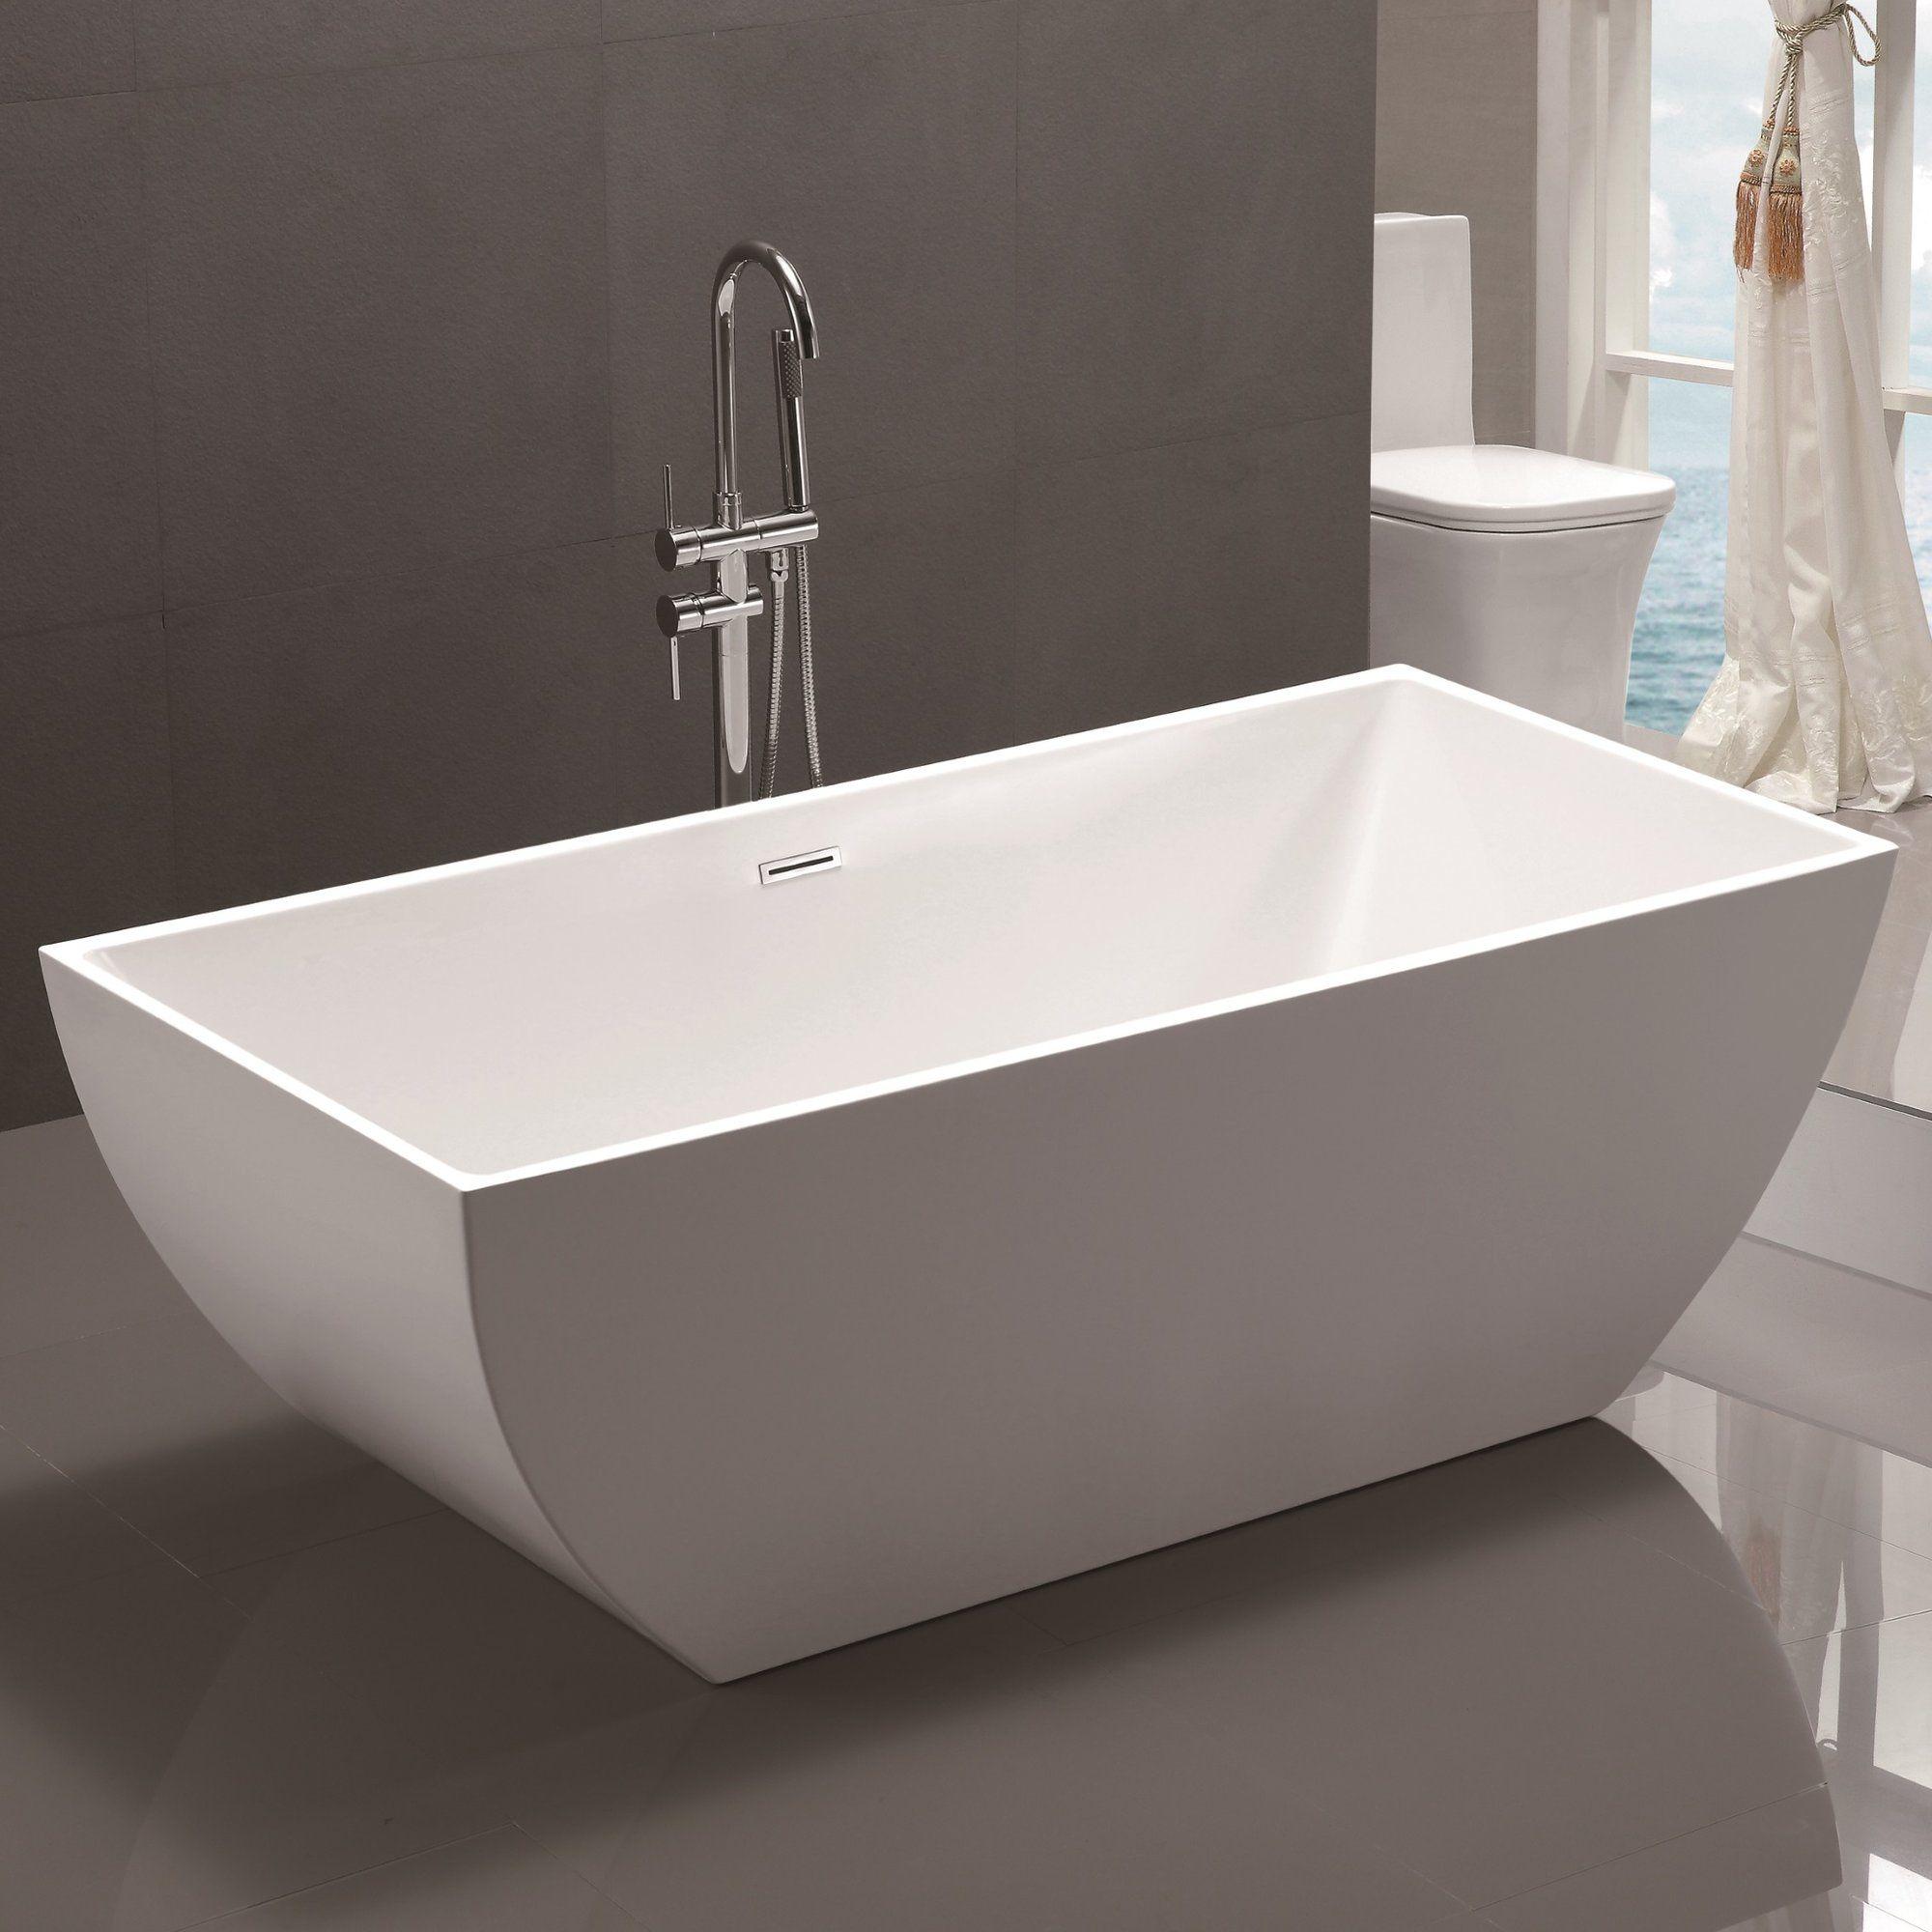 59 X 30 Freestanding Soaking Bathtub Soaking Bathtubs Acrylic